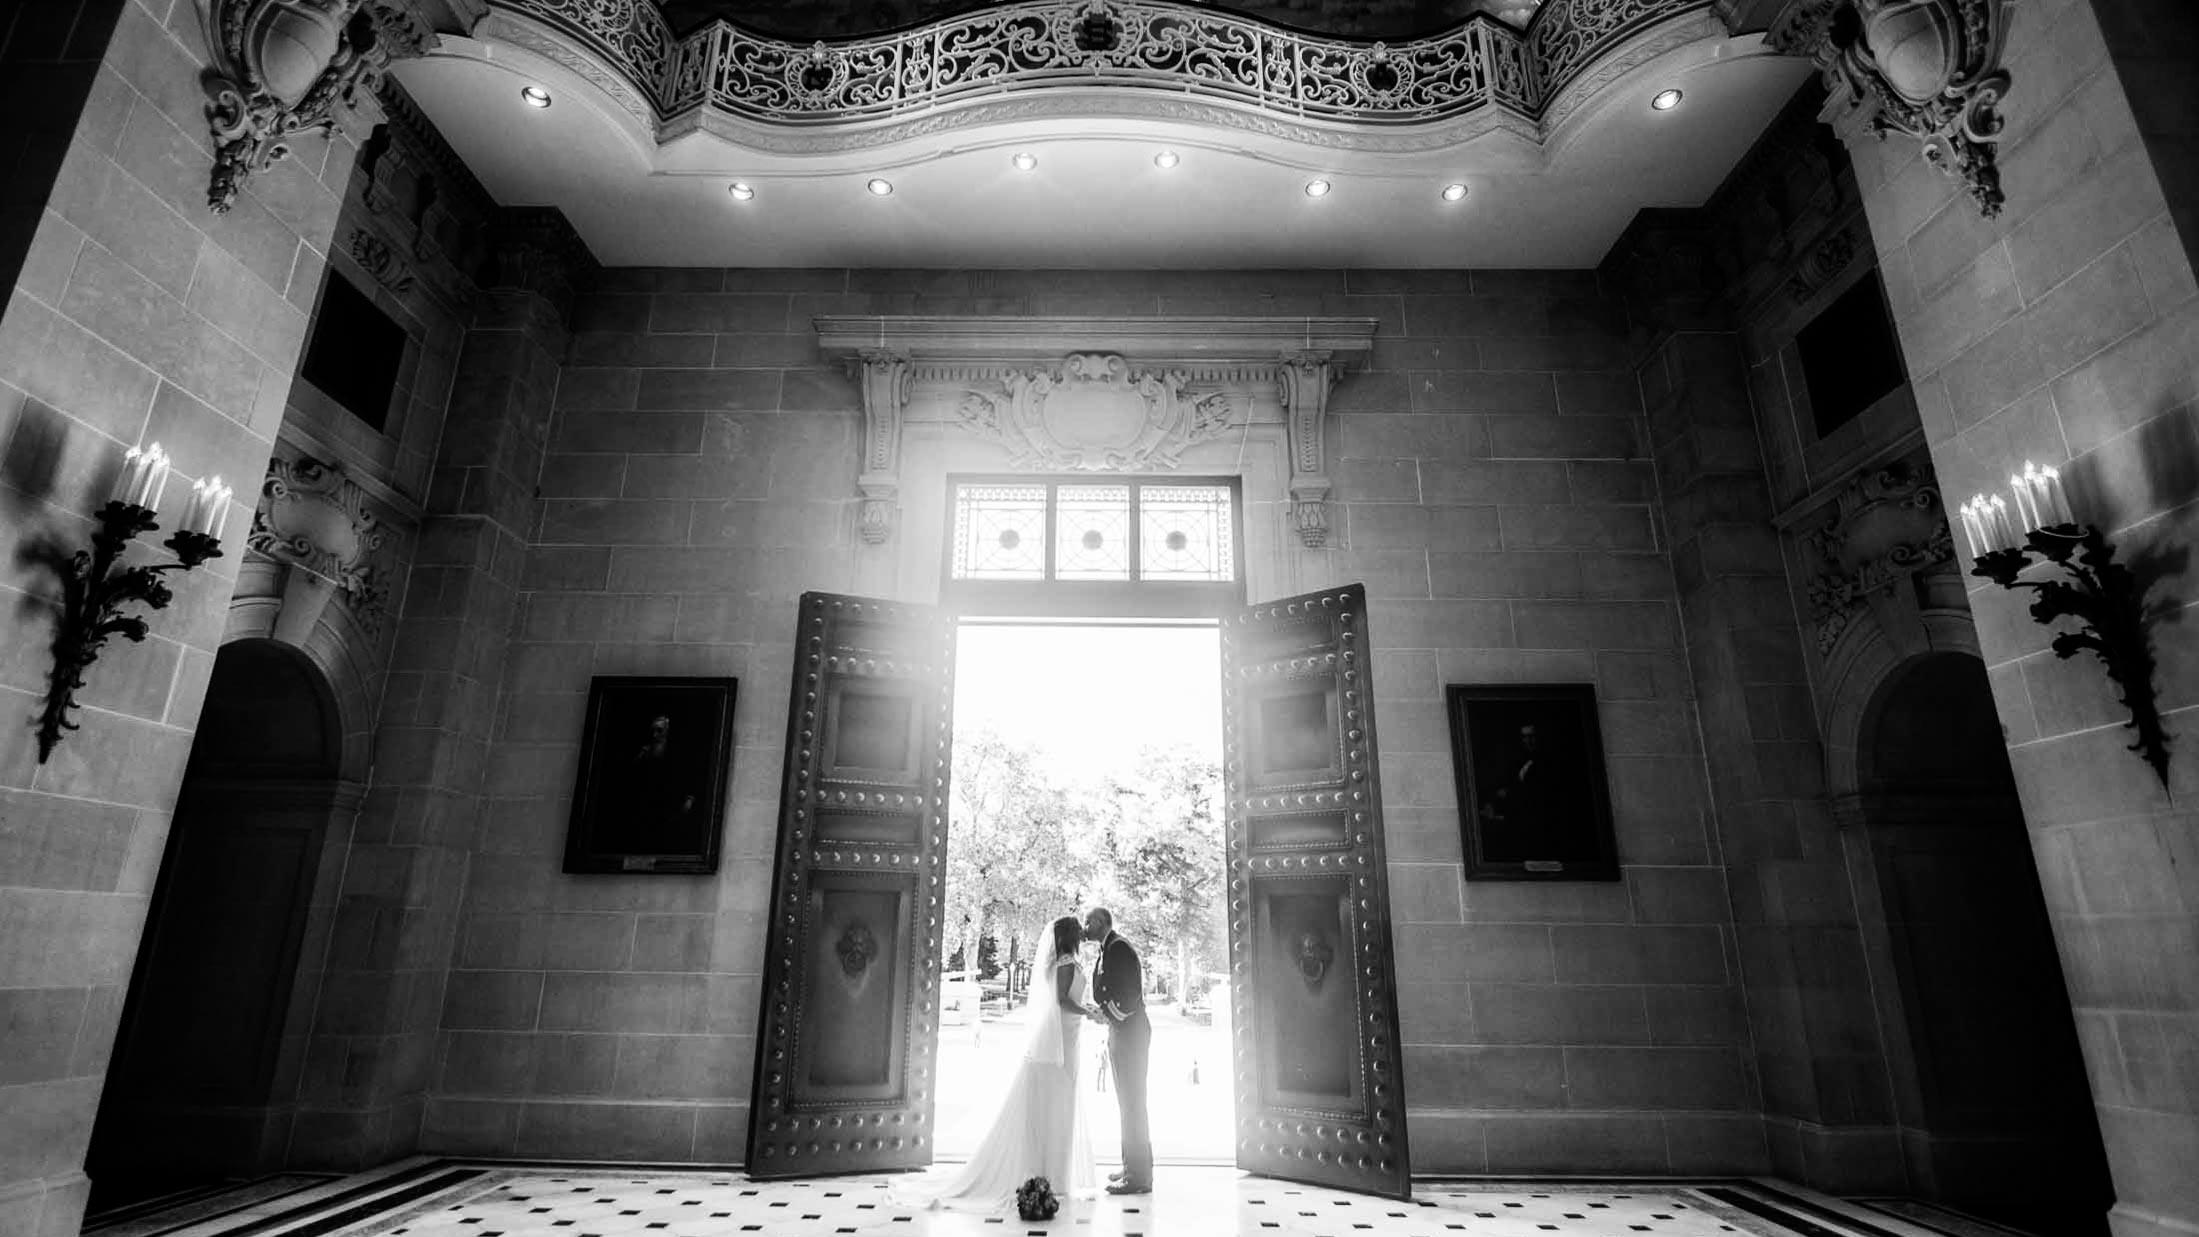 dc+metro+wedding+photographer+vadym+guliuk+photography+wedding+bride+and+groom-2032.jpg